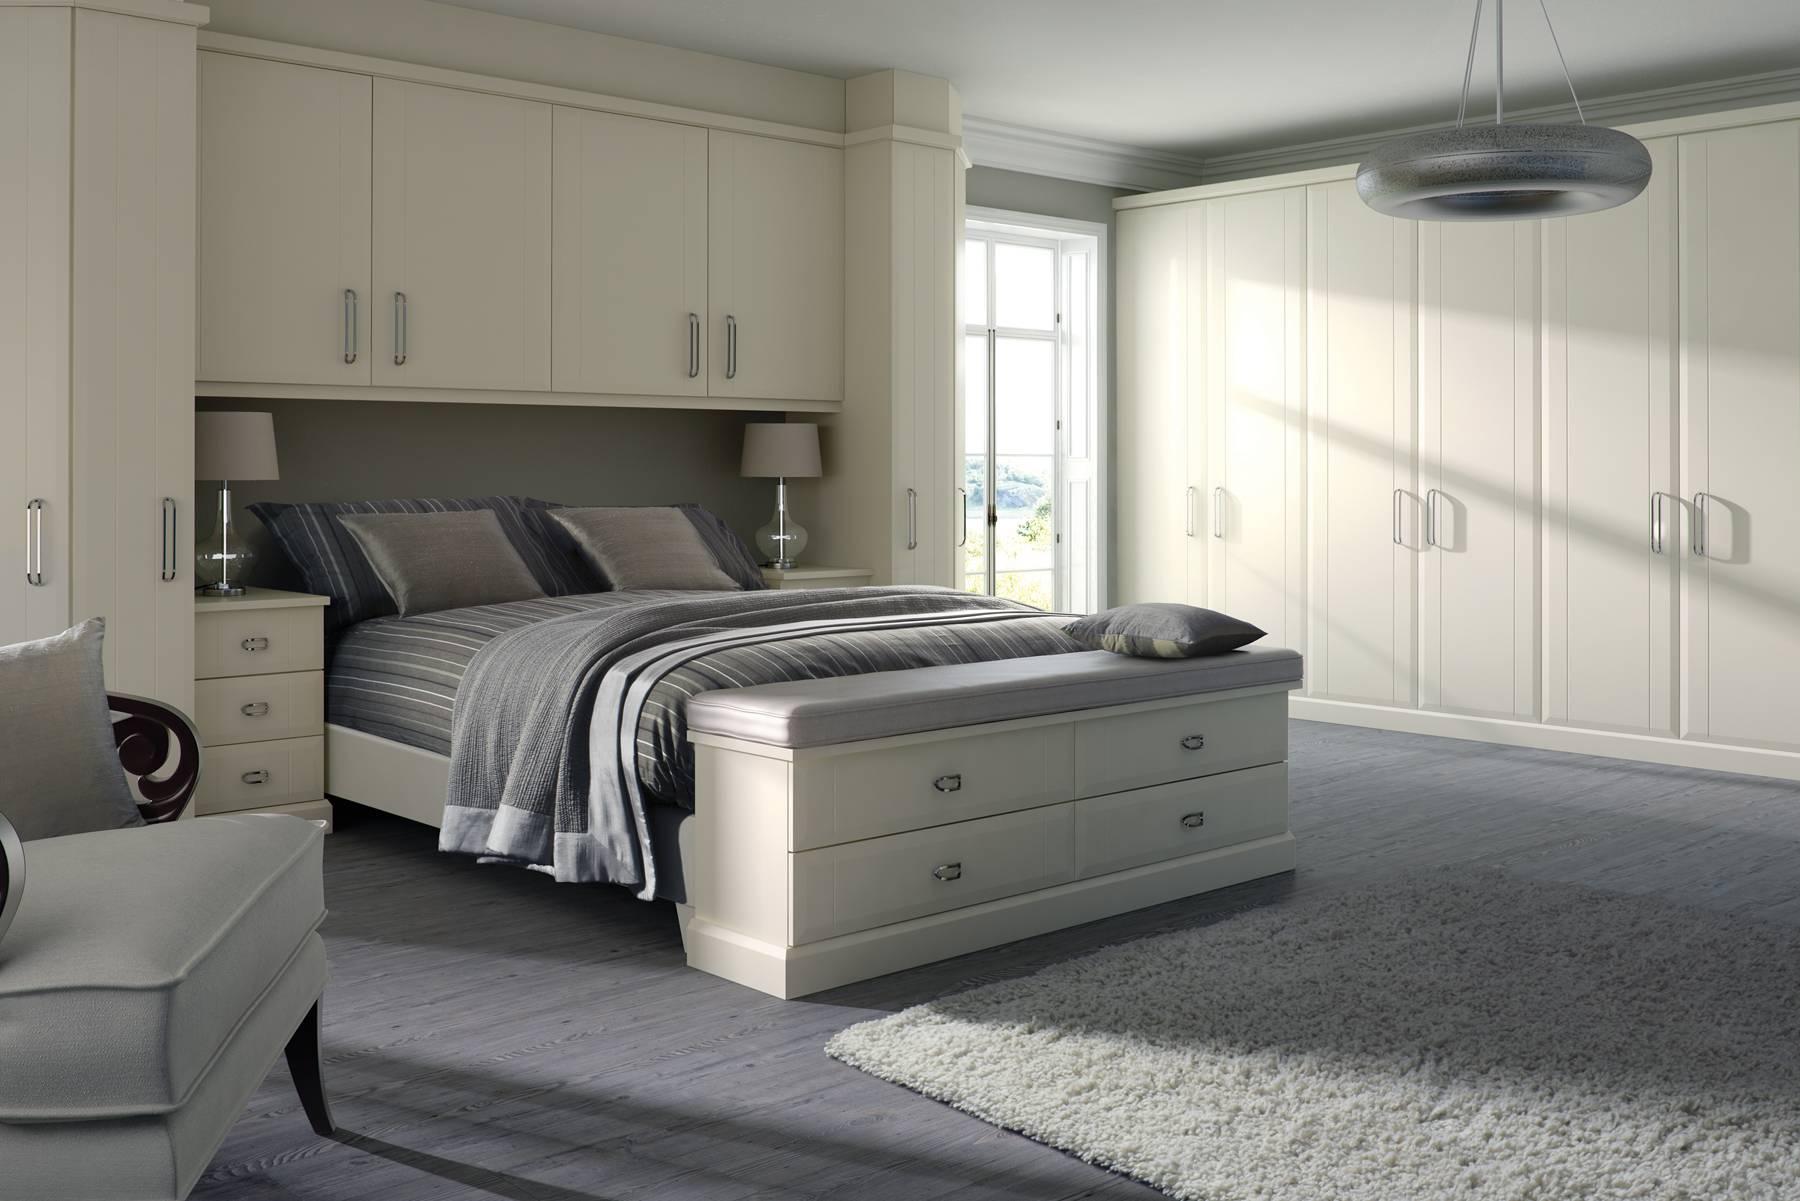 COLONIAL VIRGINIA SMOOTH WHITE BEDROOM